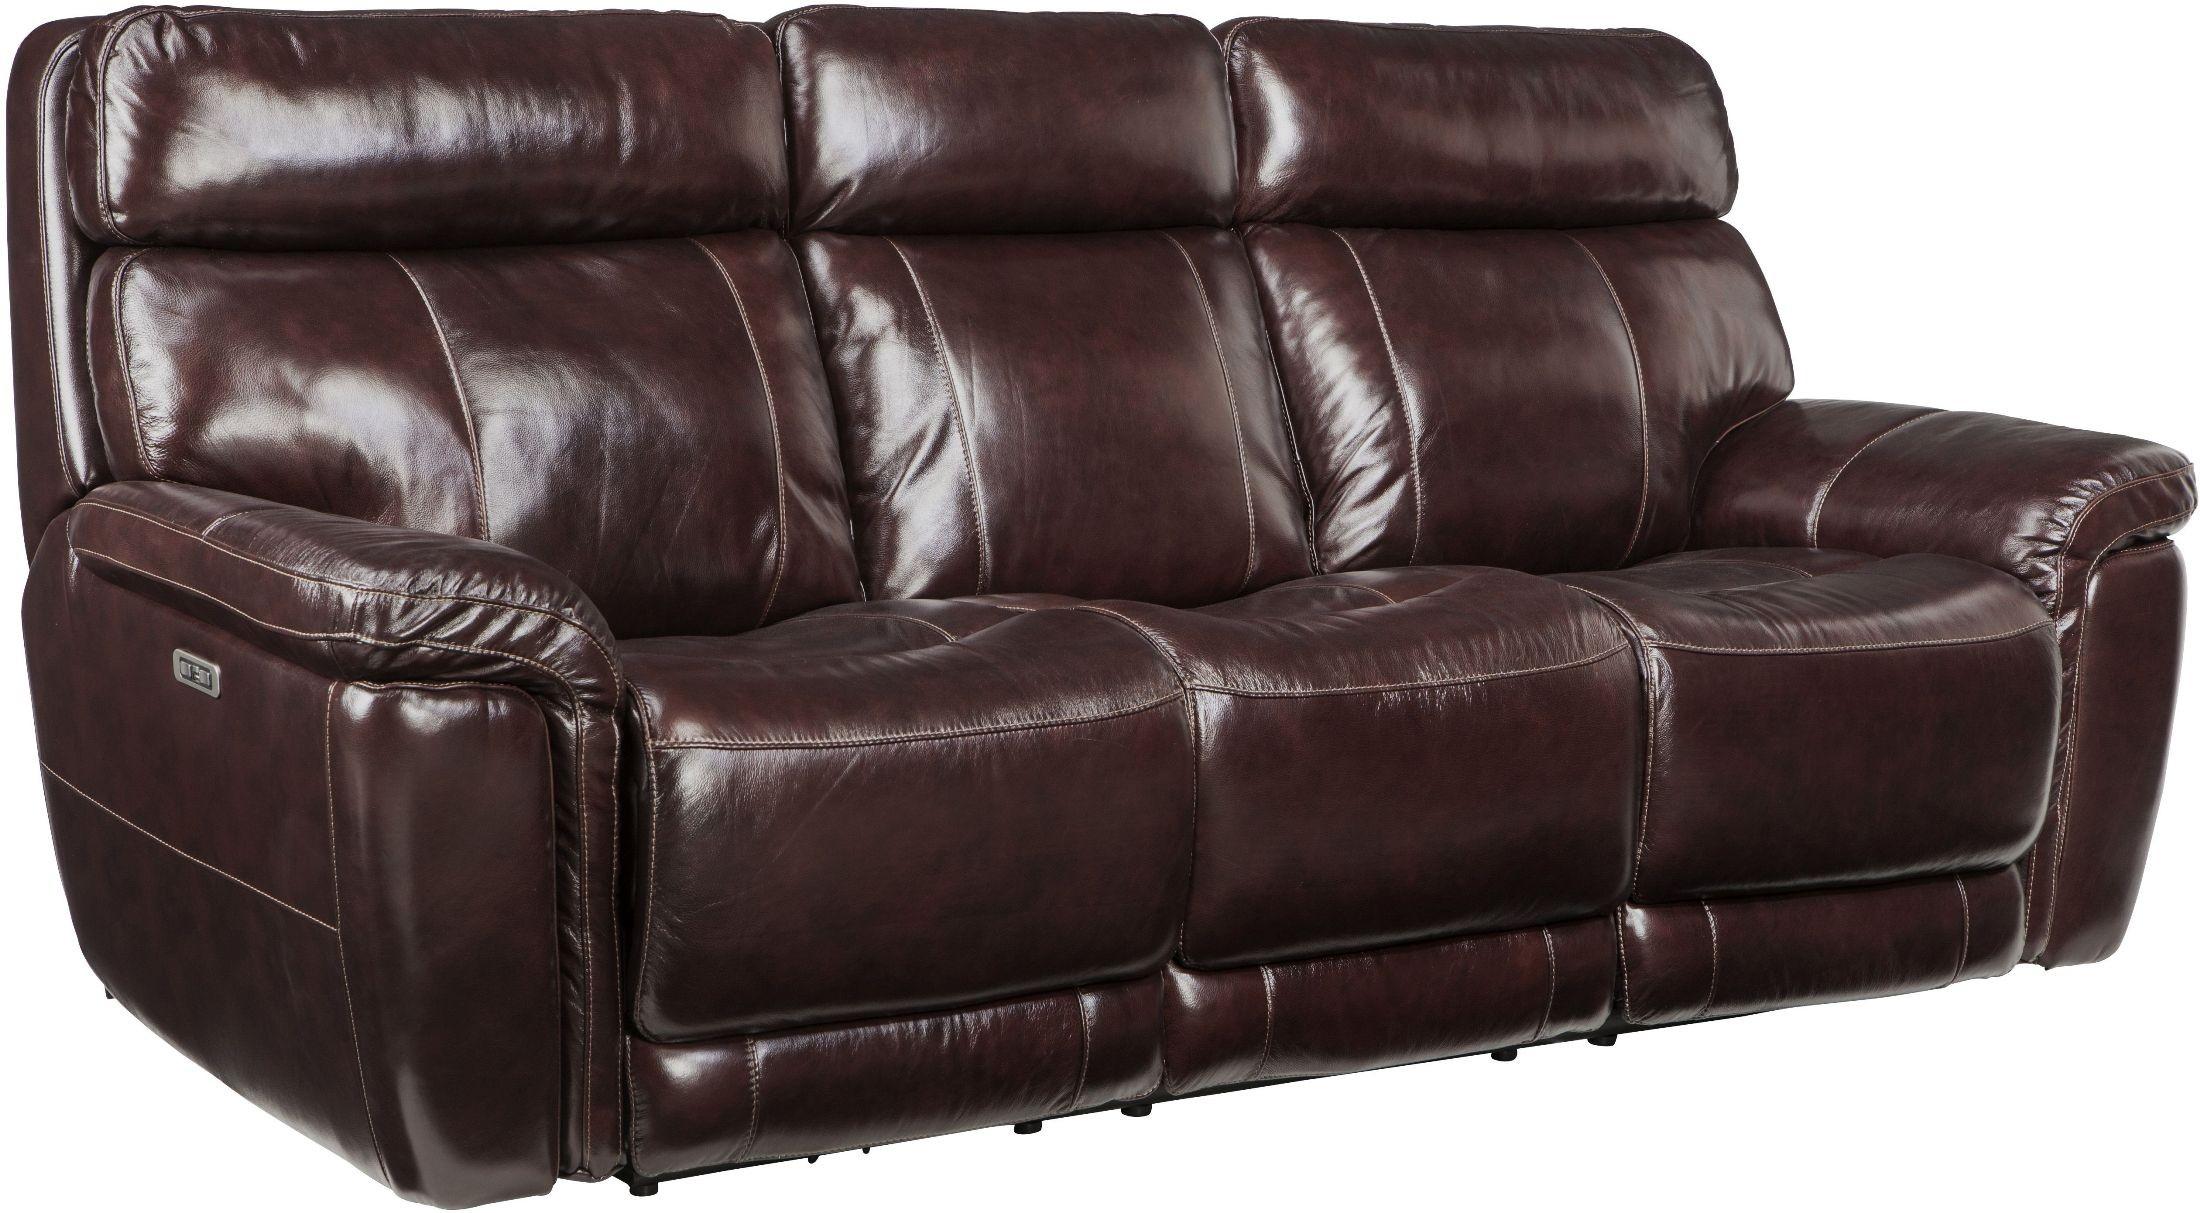 Harris Portofino Blackberry Leather Power Reclining Sofa